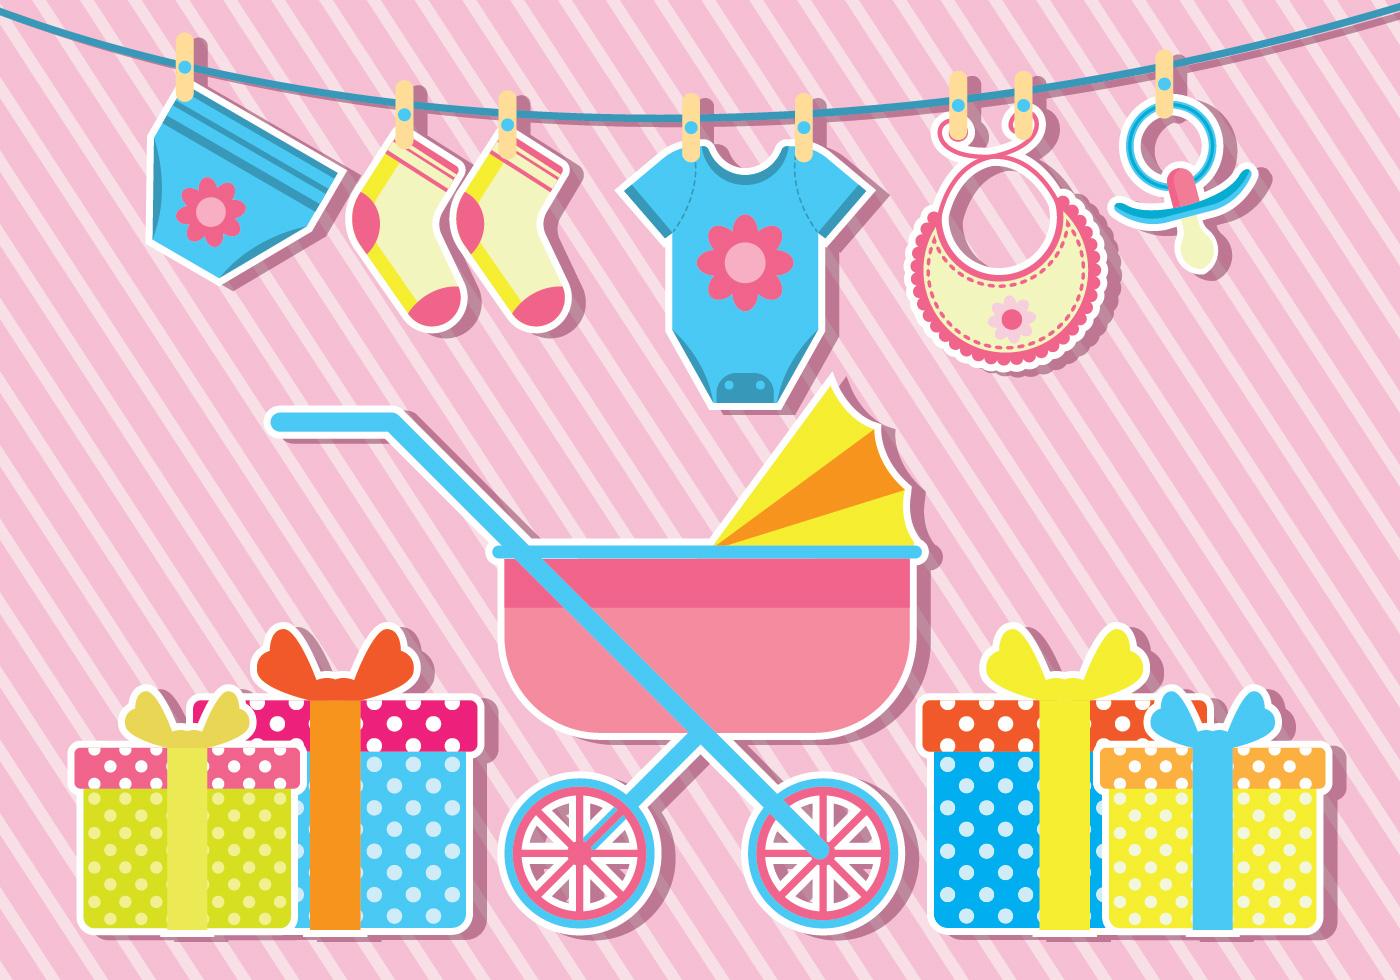 Babyshower Vector Illustration - Download Free Vectors ...